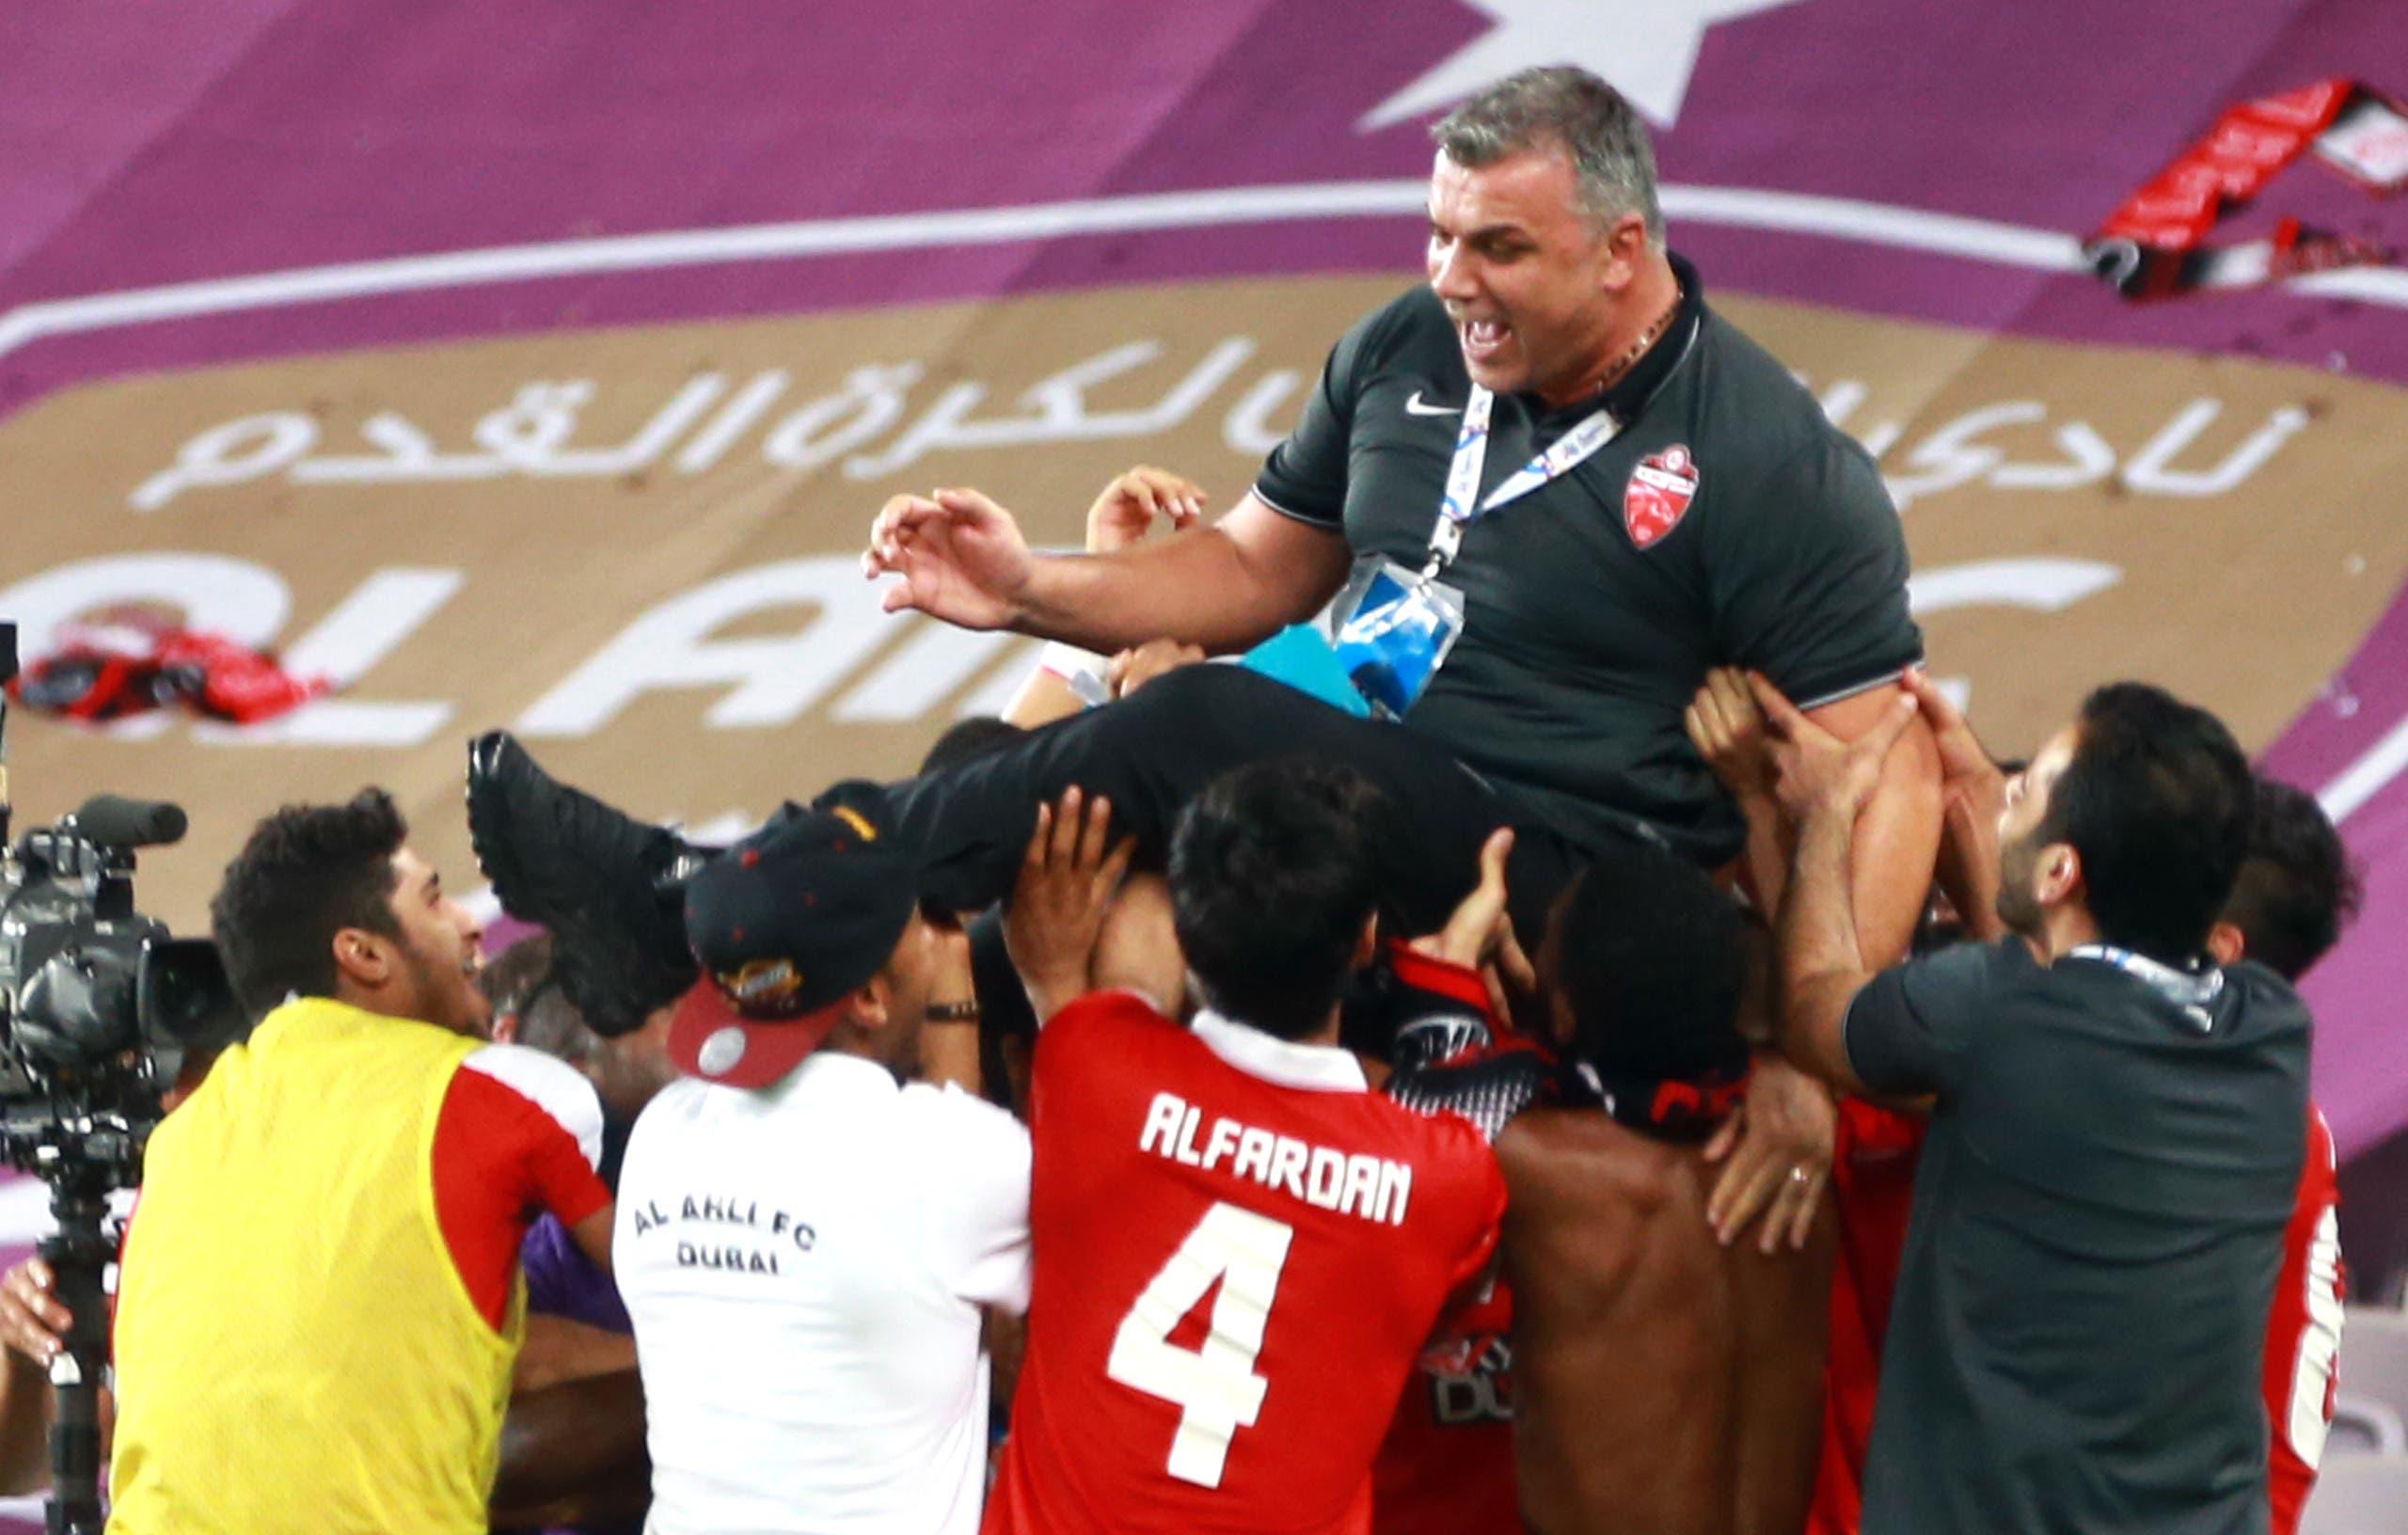 Al-Ahli team celebrating with their coach Aurelian Cosmin Olaroiu (C) during their AFC Champions League football match at Sheik Hazza Bin Zayed stadium in Al-Ain, on May 27, 2015. AFP